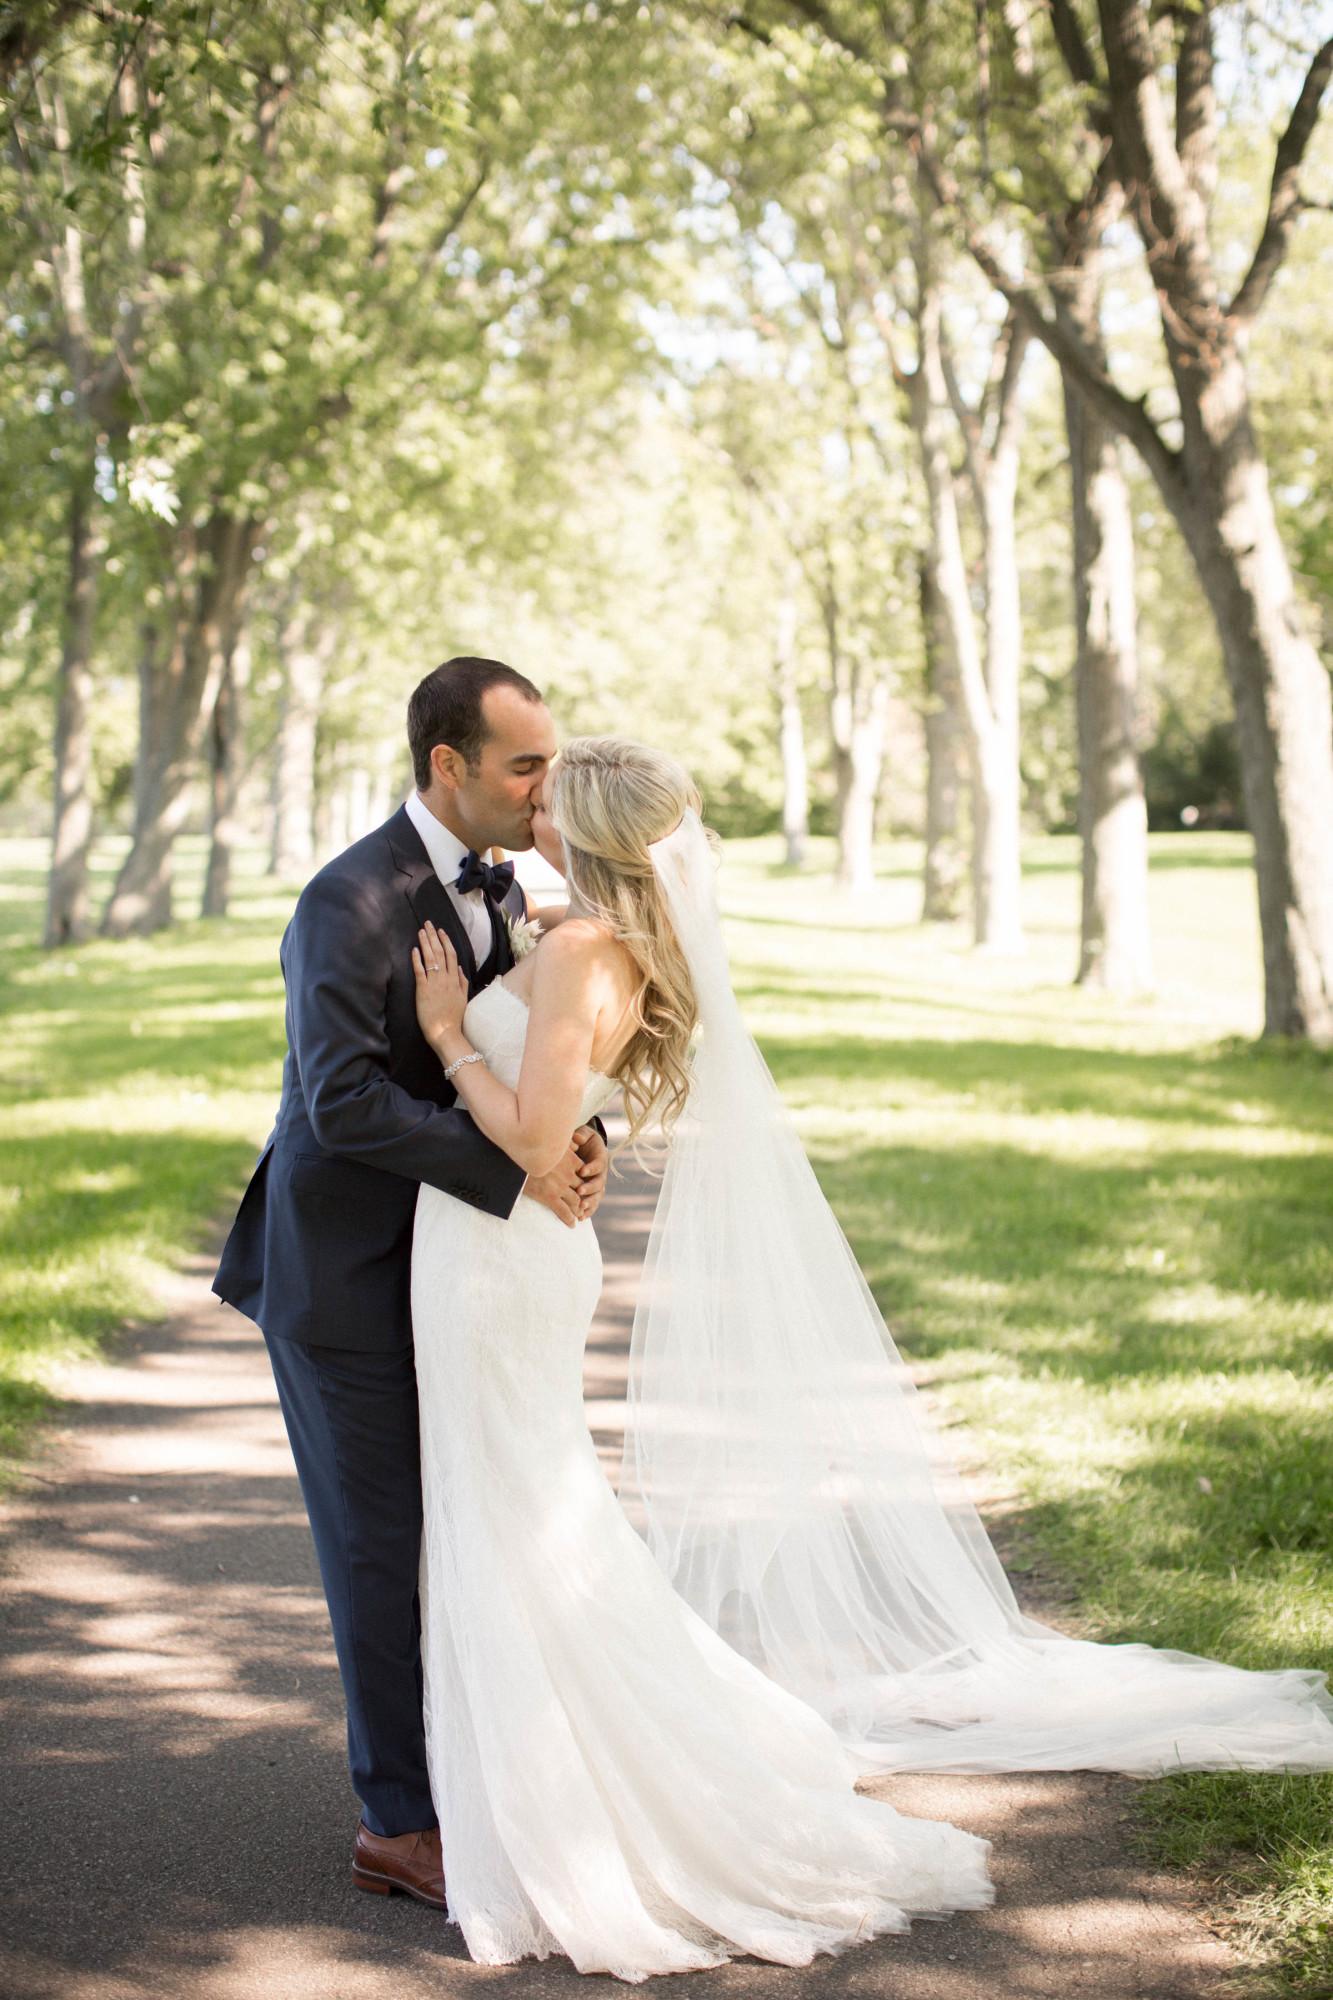 white oaks summer wedding niagara on the lake blush and navy amanda cowley events wedding planner nataschia wielink photography